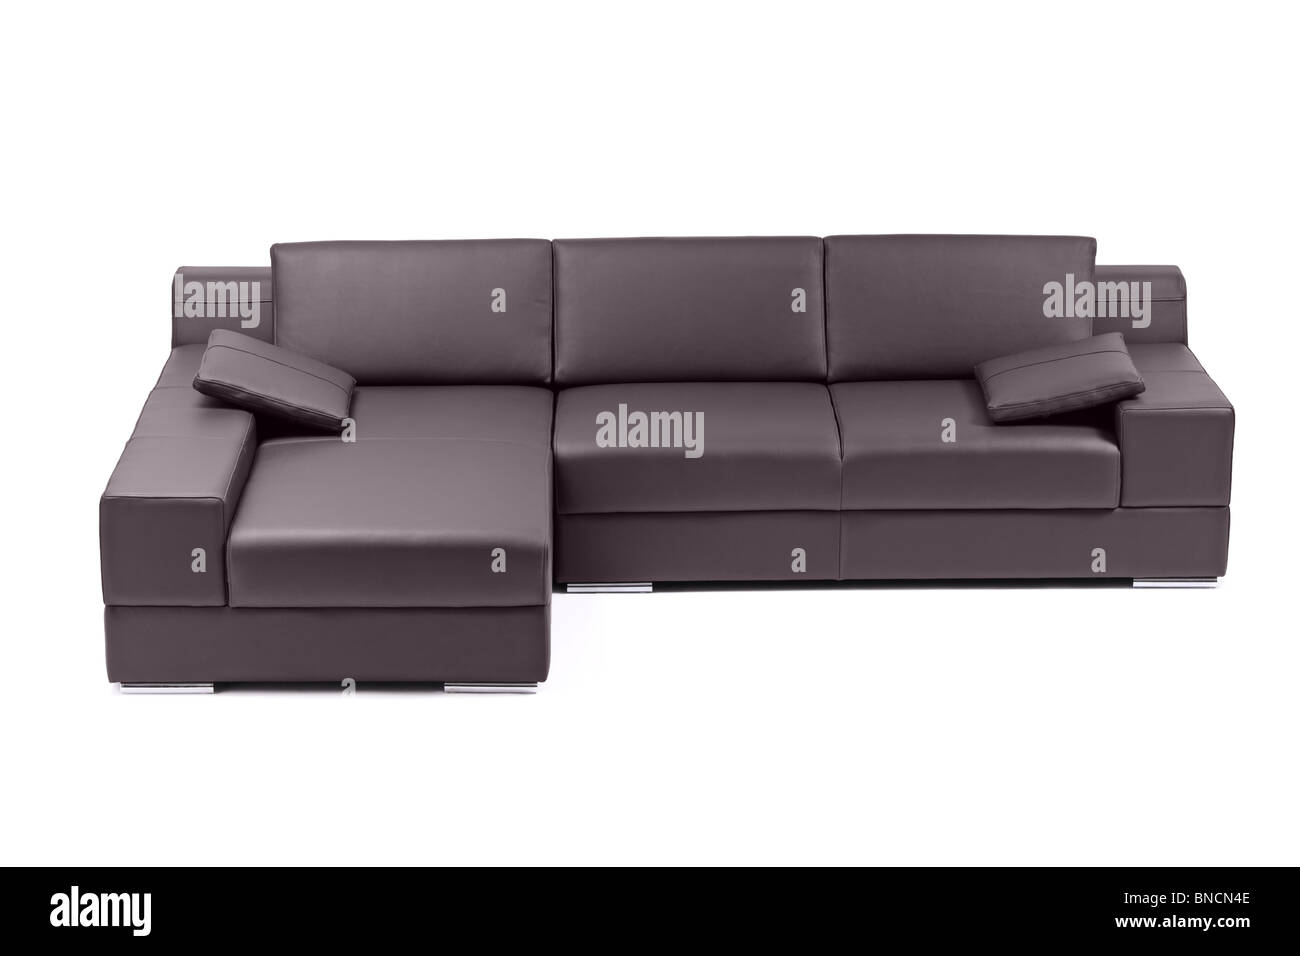 Canapé en cuir noir moderne Photo Stock